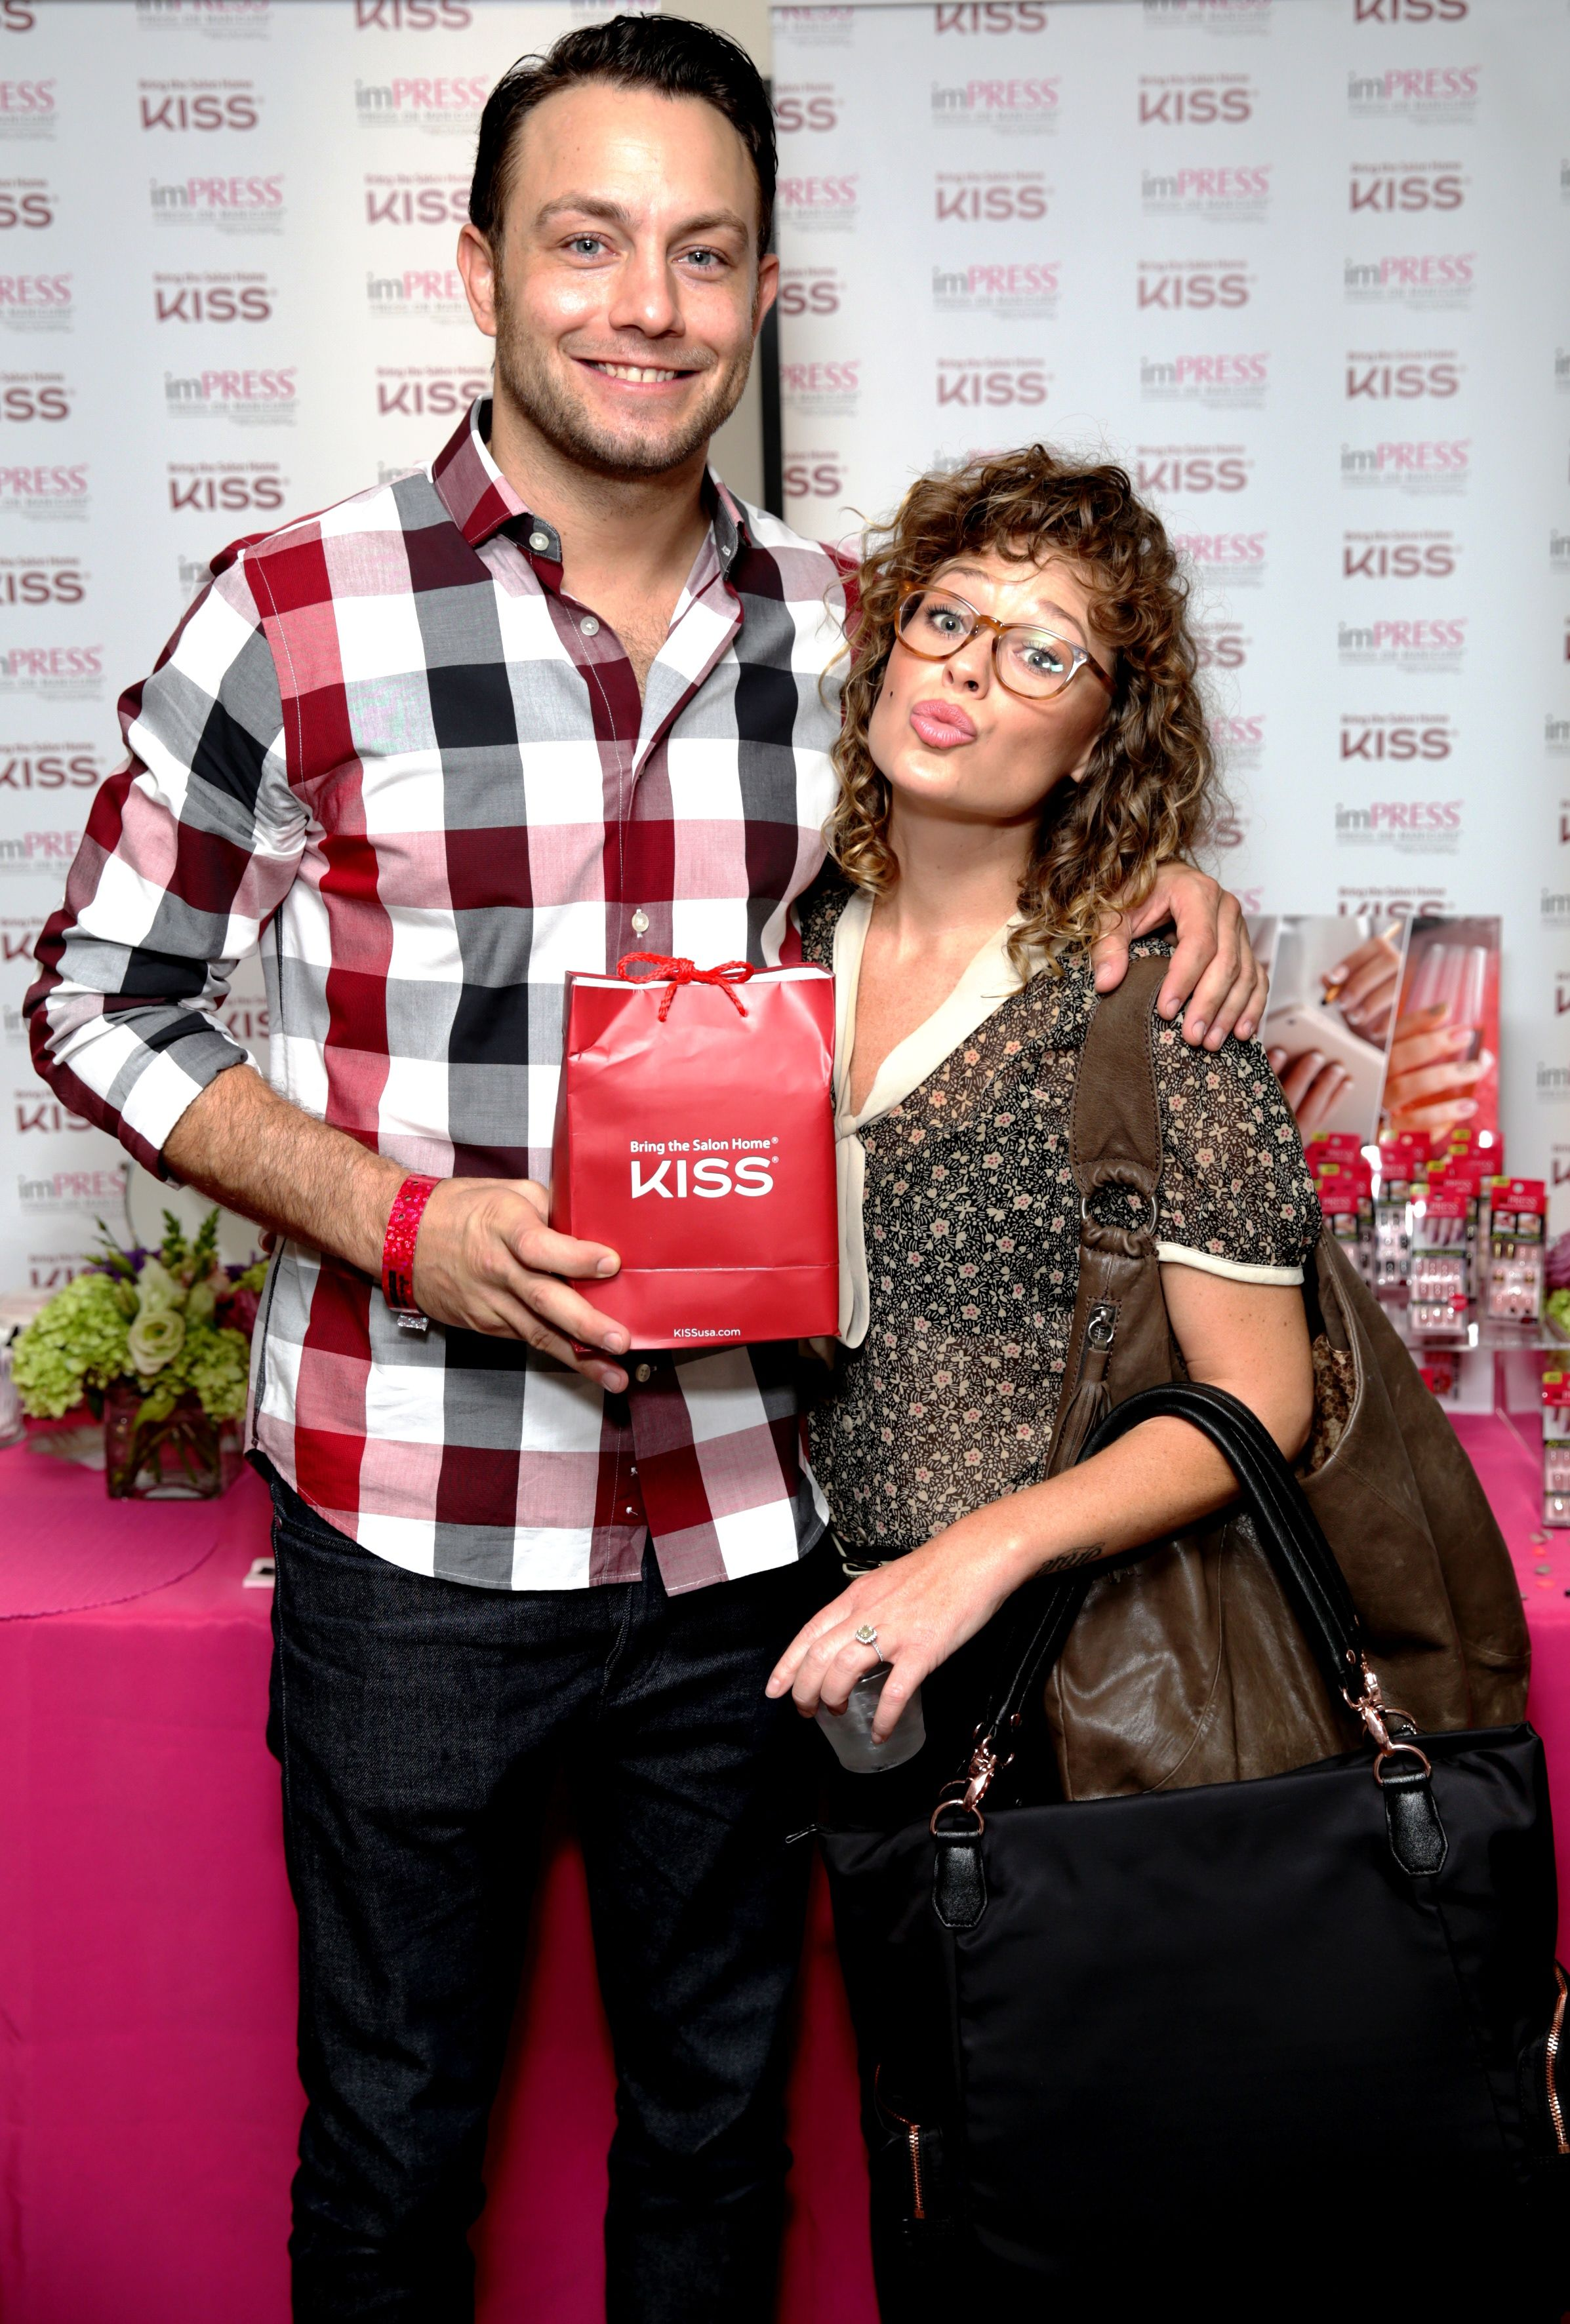 Jonathan Sadowski #celebrity #gift #emmys2015 #kissnails #imPRESSmanicure #kisslashes